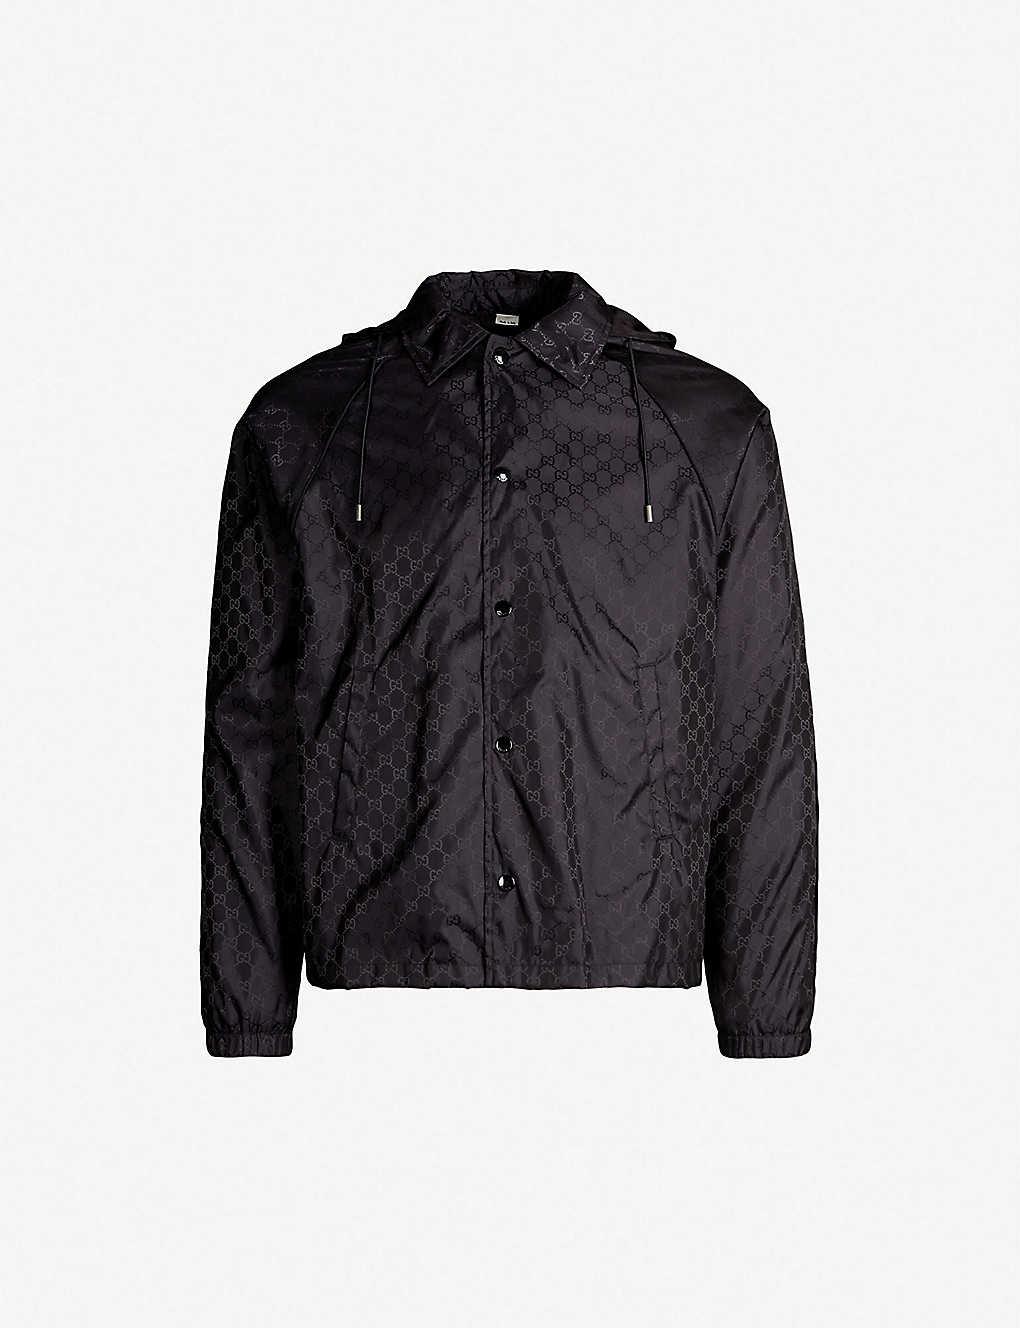 4c972d0e7 GUCCI - Monogram-print hooded shell jacket | Selfridges.com